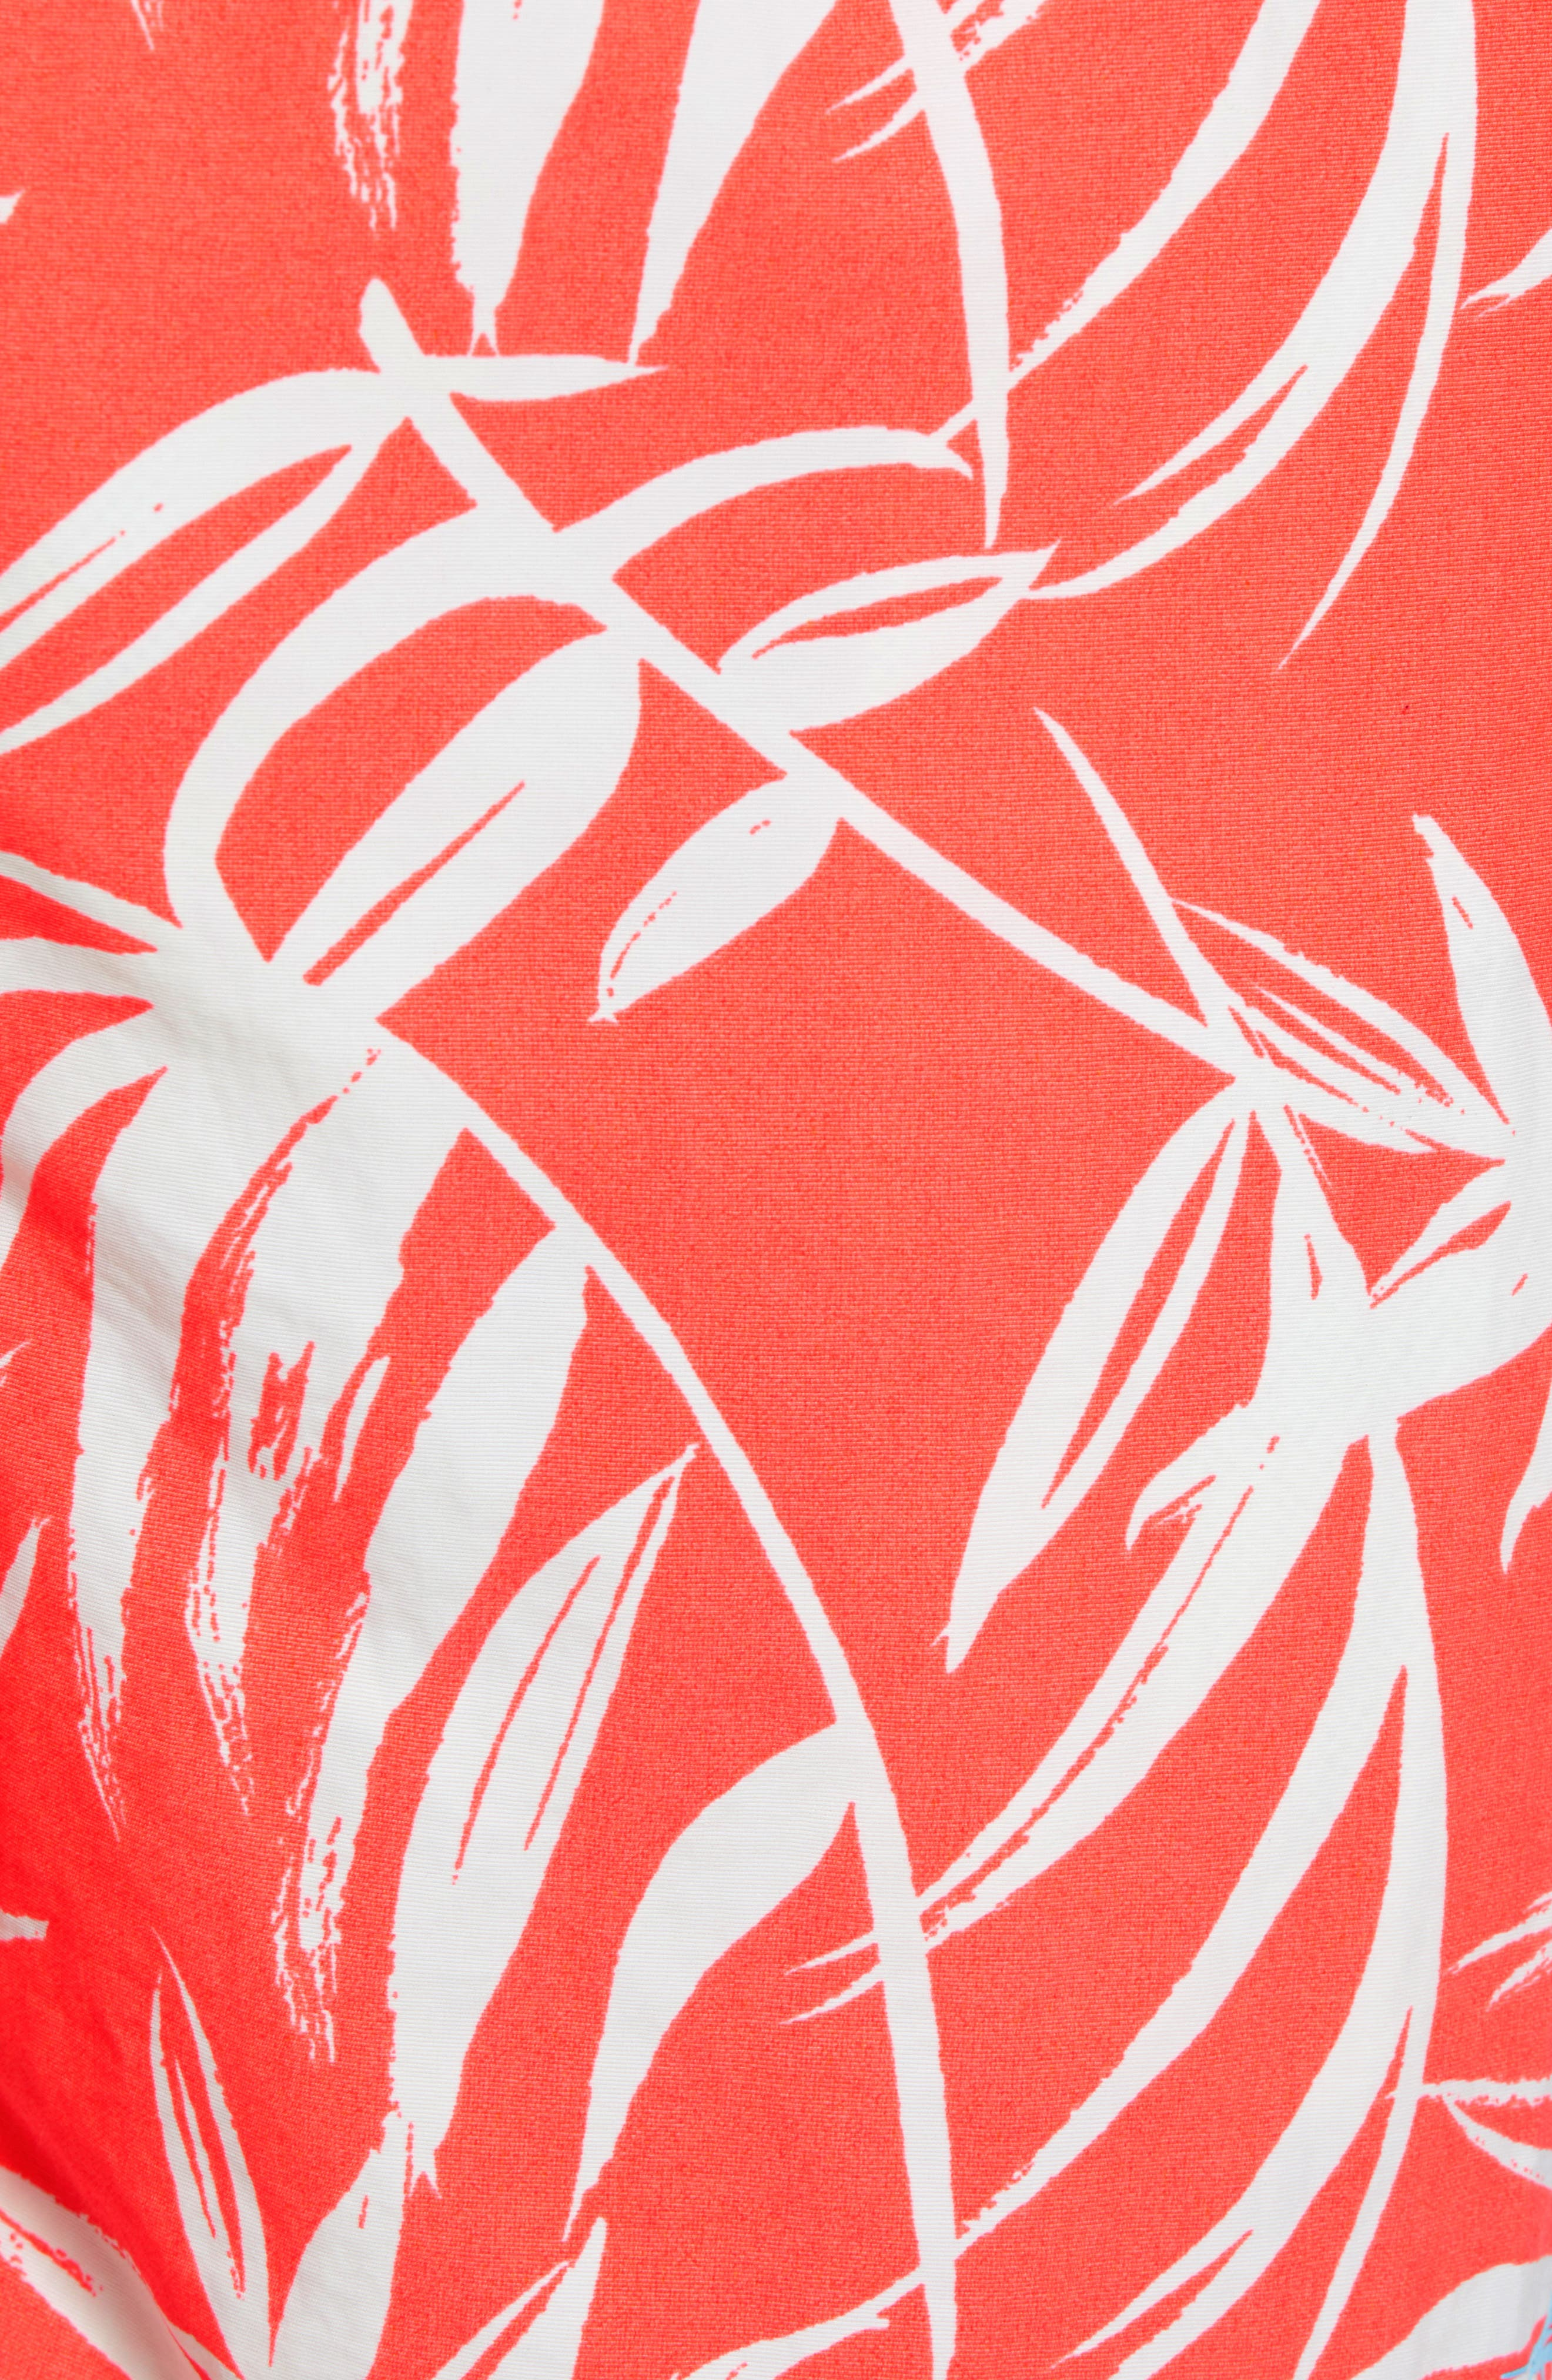 Naples Muy Caliente Swim Trunks,                             Alternate thumbnail 5, color,                             Electric Coral